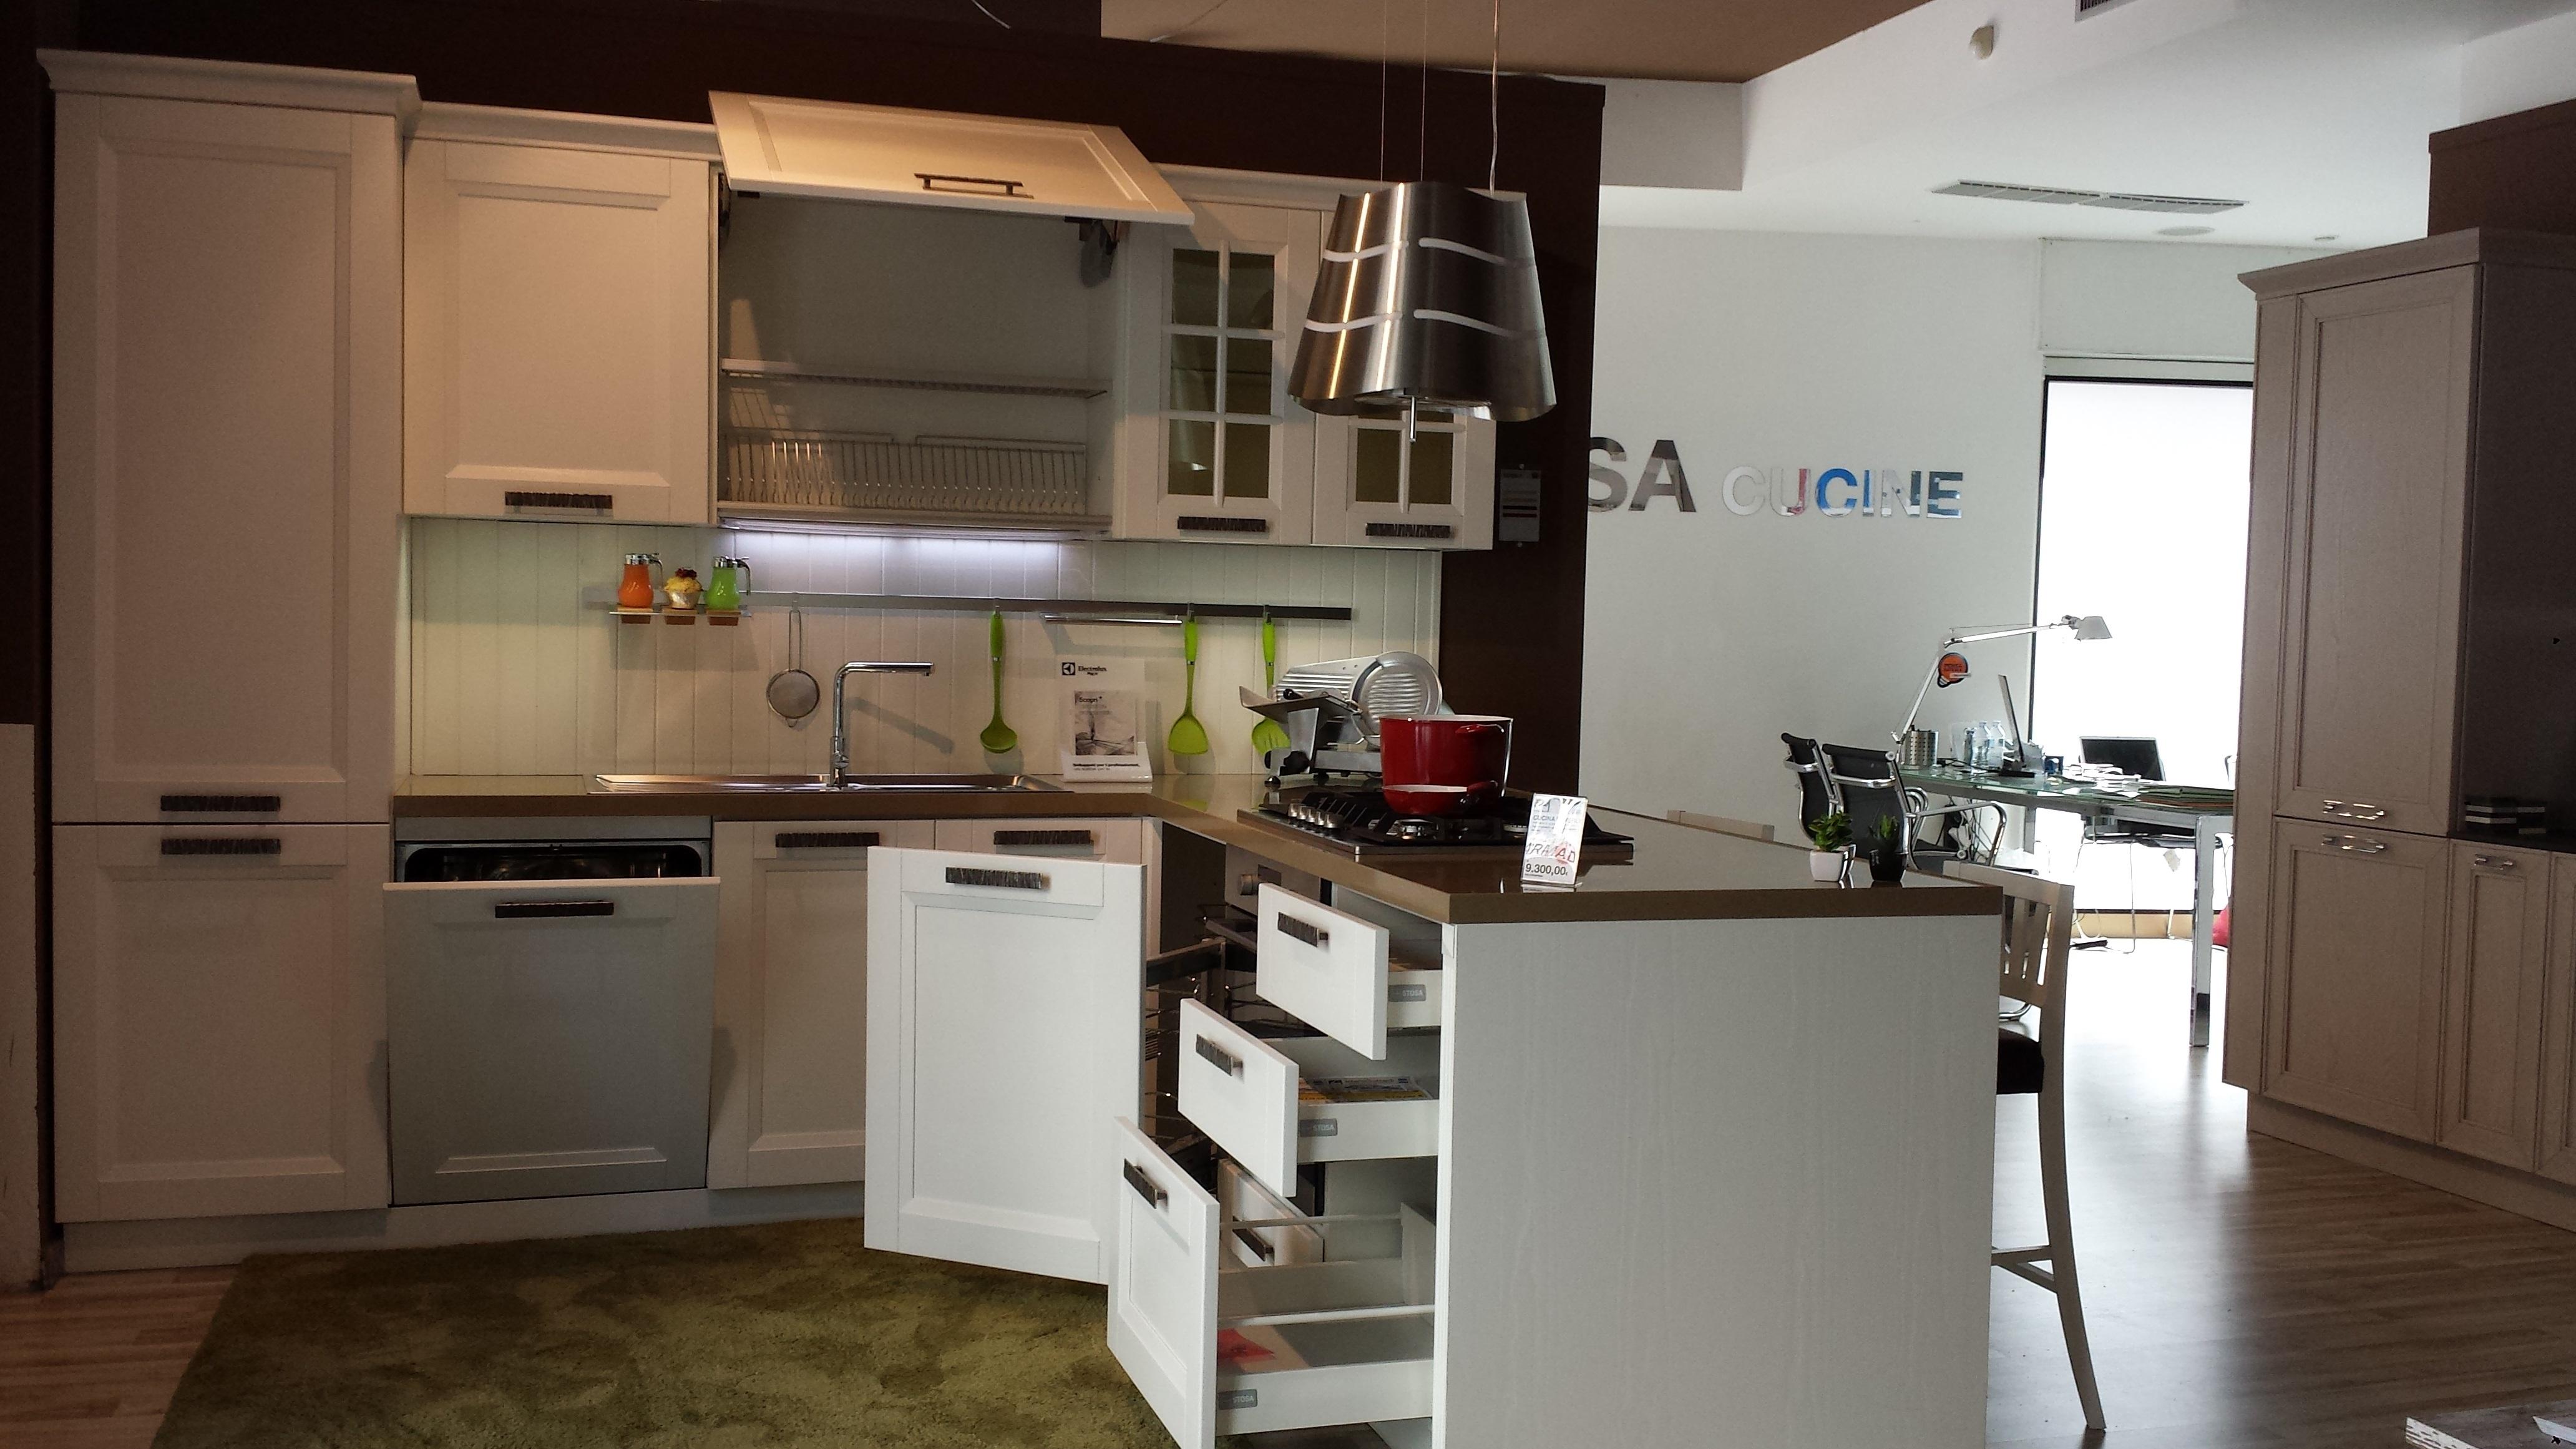 Cucina stosa mod beverly completa di elettrodomestici - Cucina beverly stosa ...